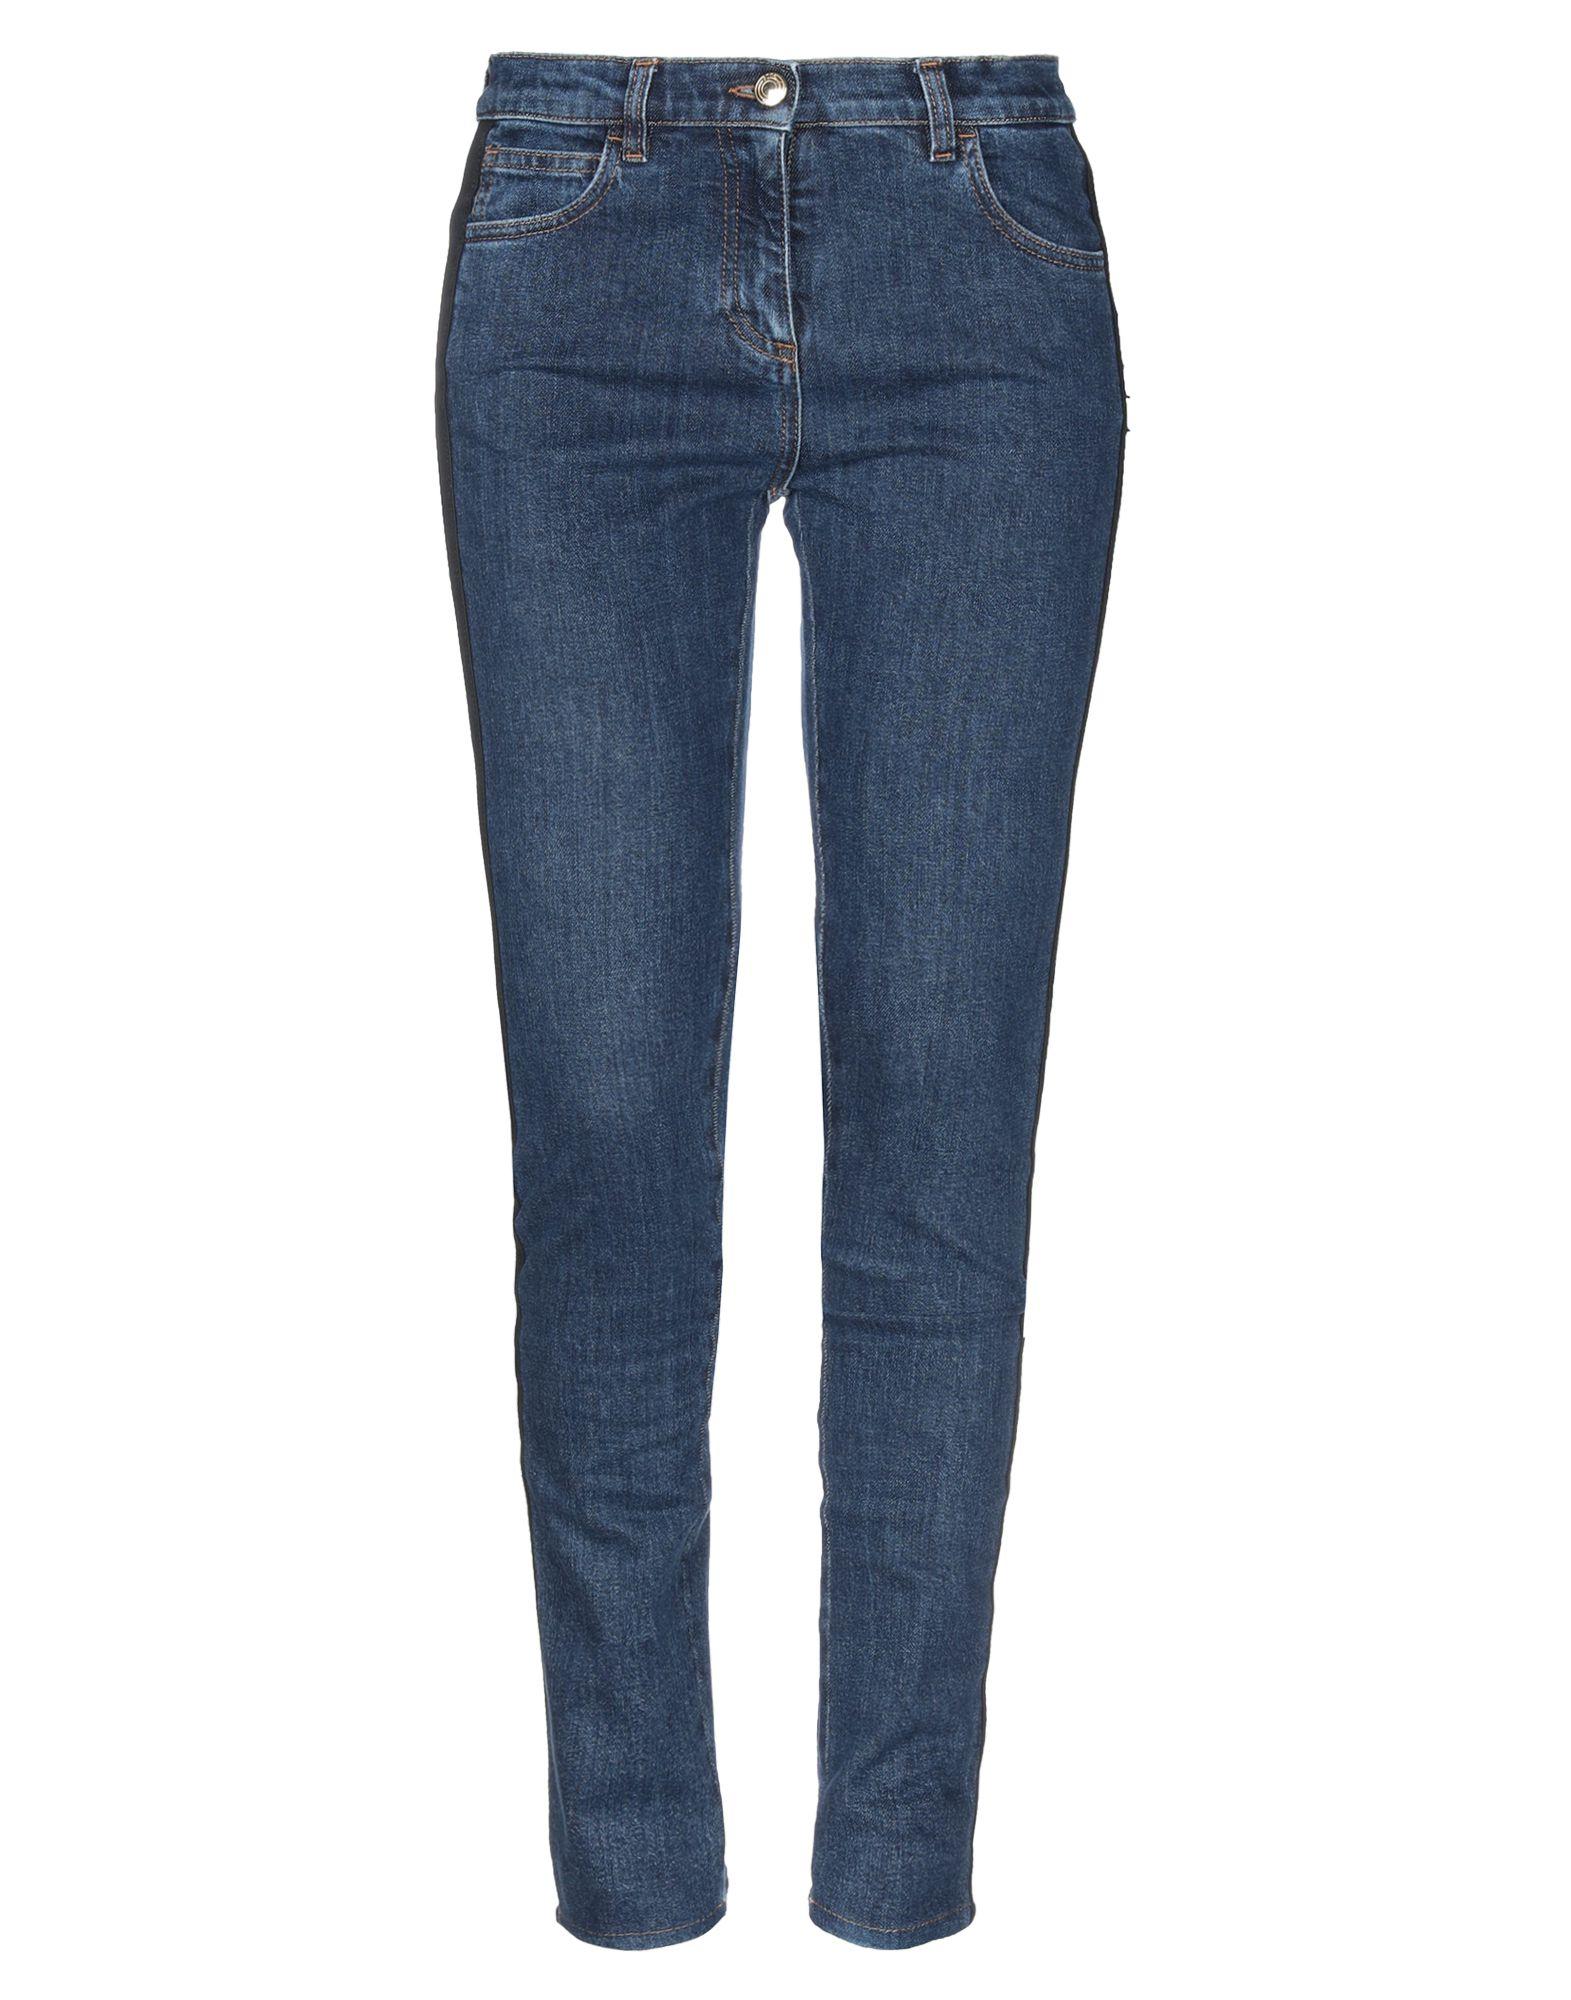 GCDS Jeans. denim, logo, side seam stripes, solid color, medium wash, mid rise, front closure, button, zip, multipockets, stretch, contains non-textile parts of animal origin. 98% Cotton, 2% Elastane